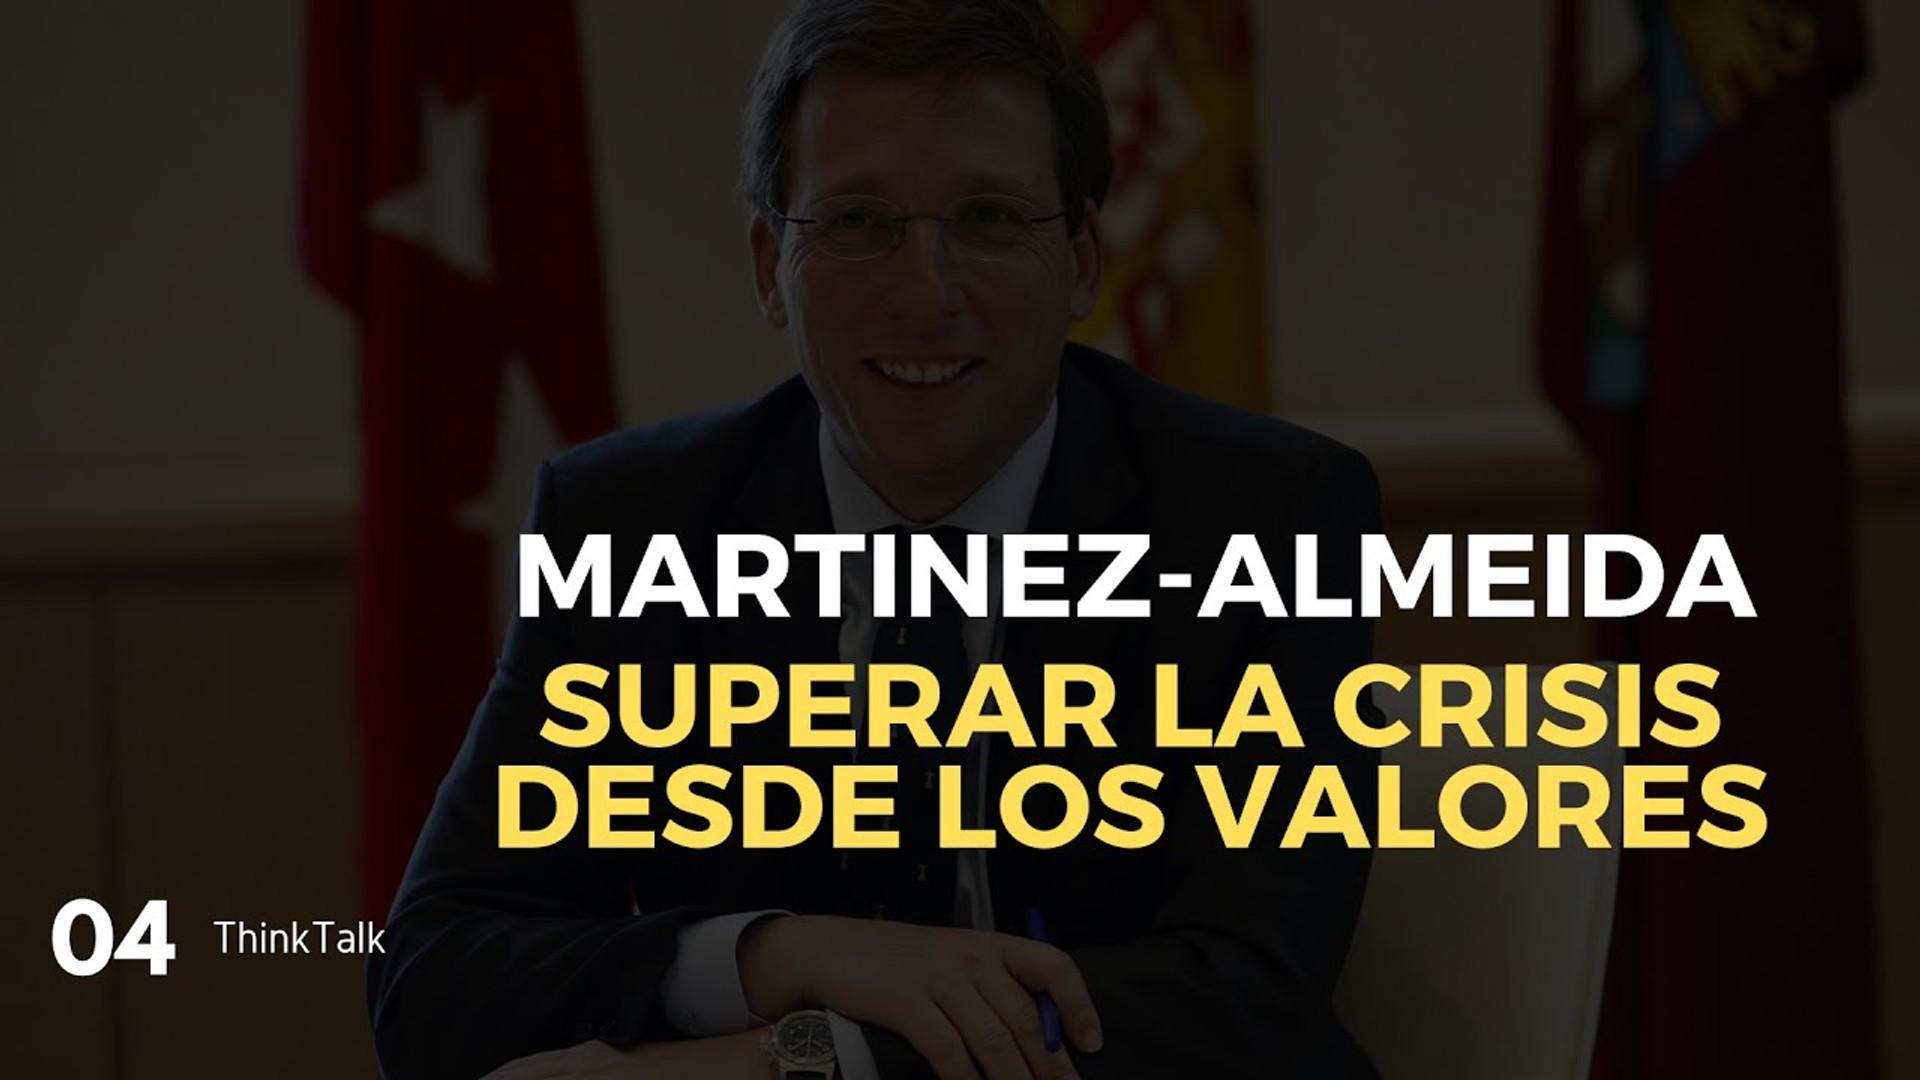 ThinkTalk4: Jose Luís Martínez-Almeida, Alcalde de Madrid